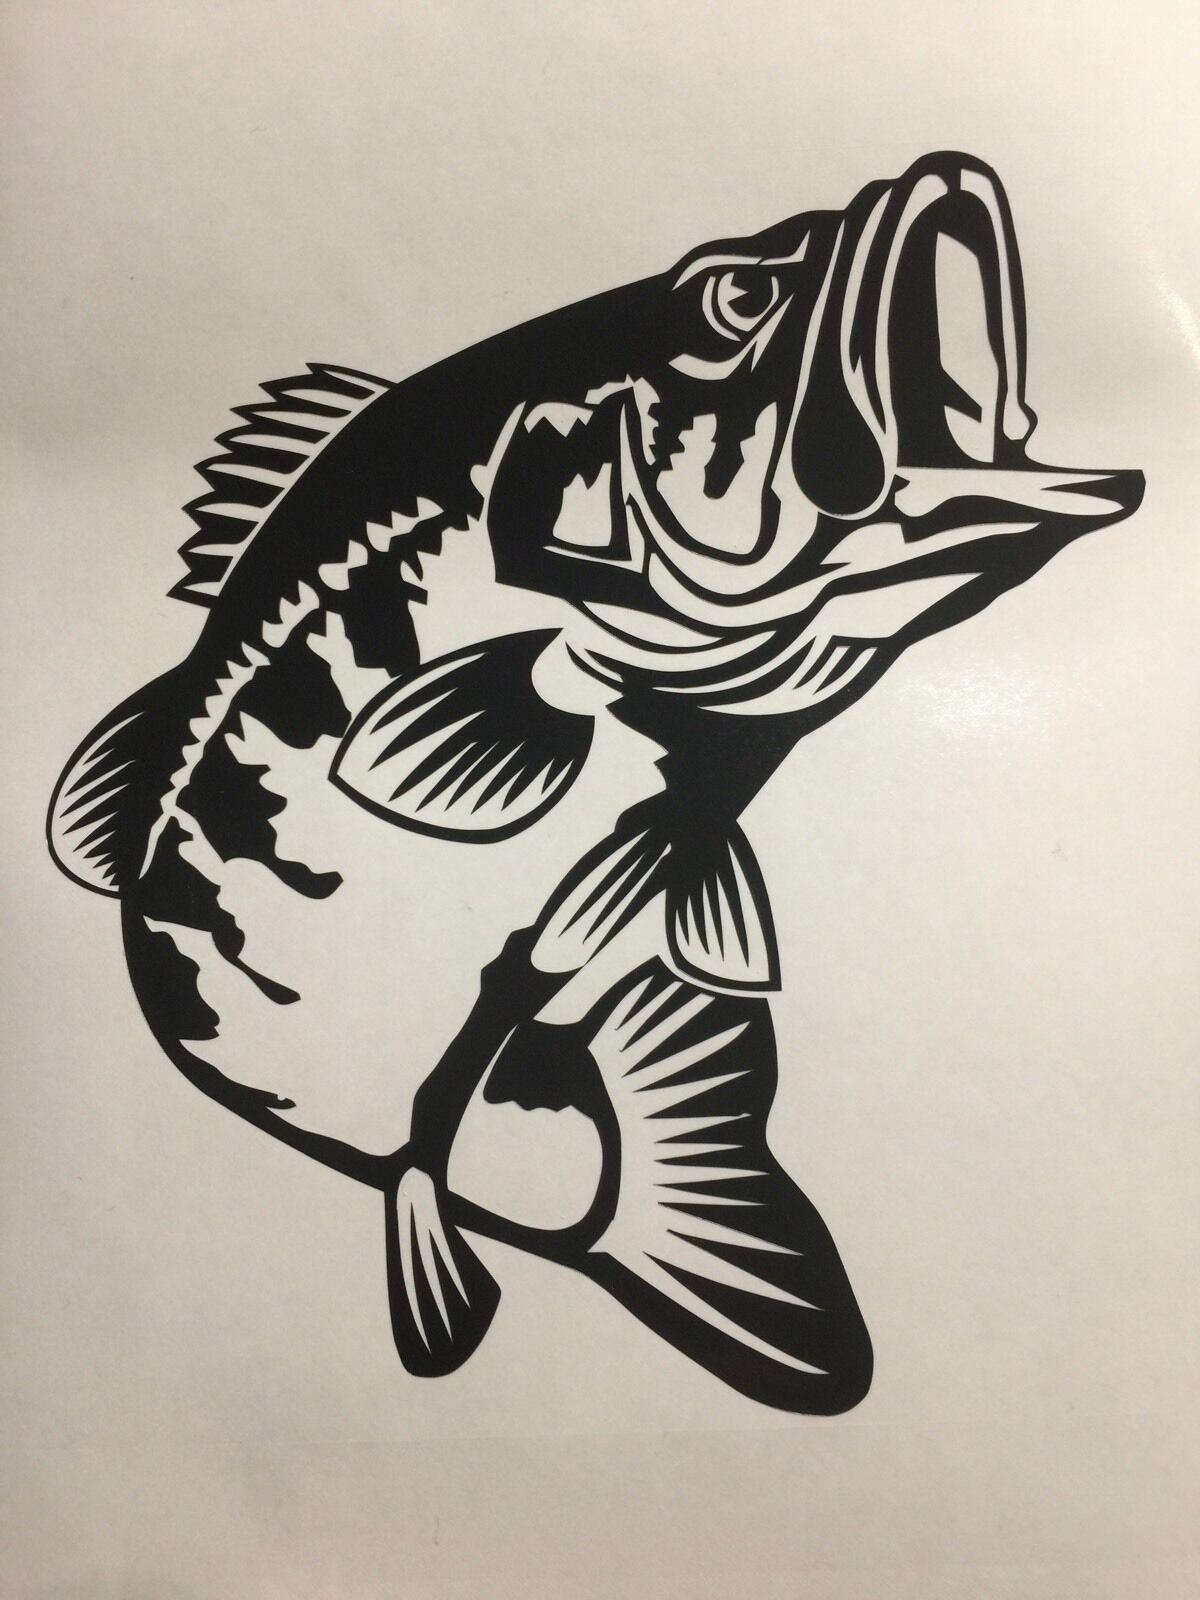 Bass Fishing Decal Sticker Vinyl Logo Lund Fishing Rod Bass